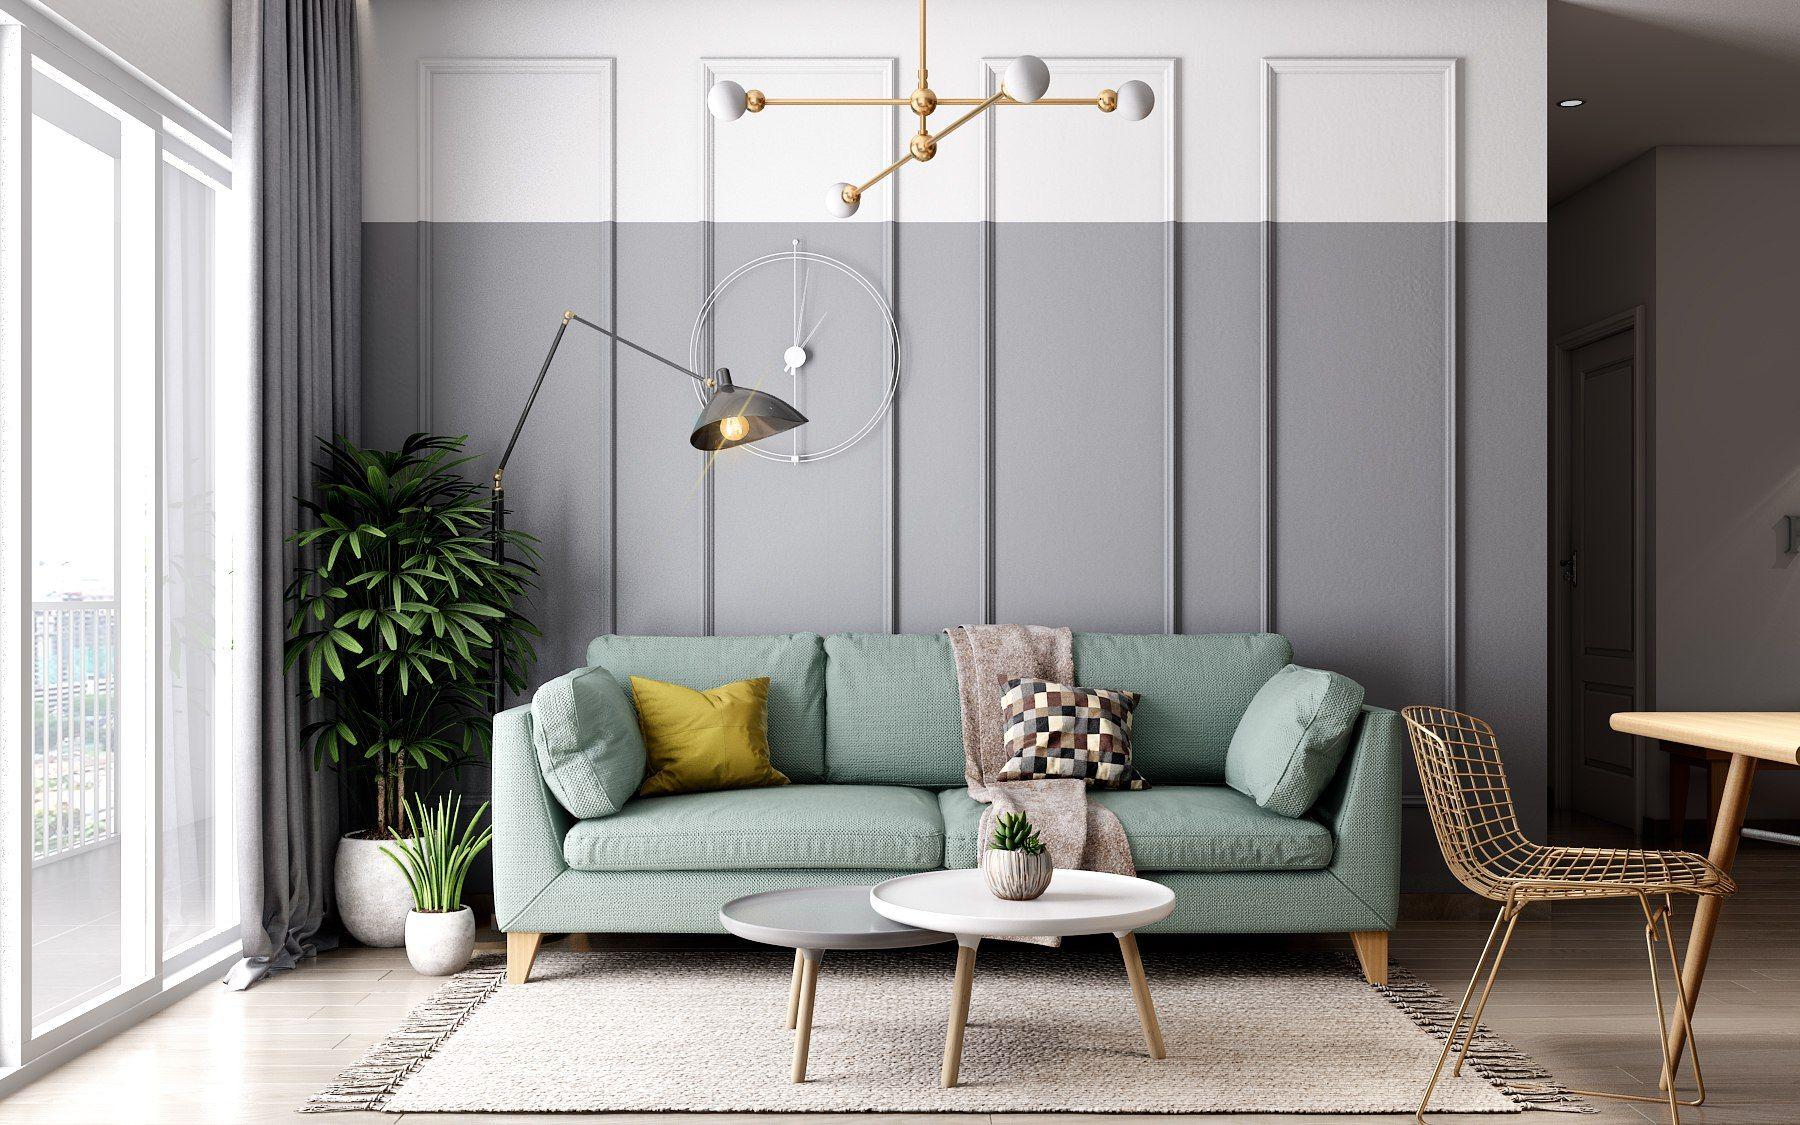 Top 10 Interior Paint Colors Trending for 2019 - TrendBook ...